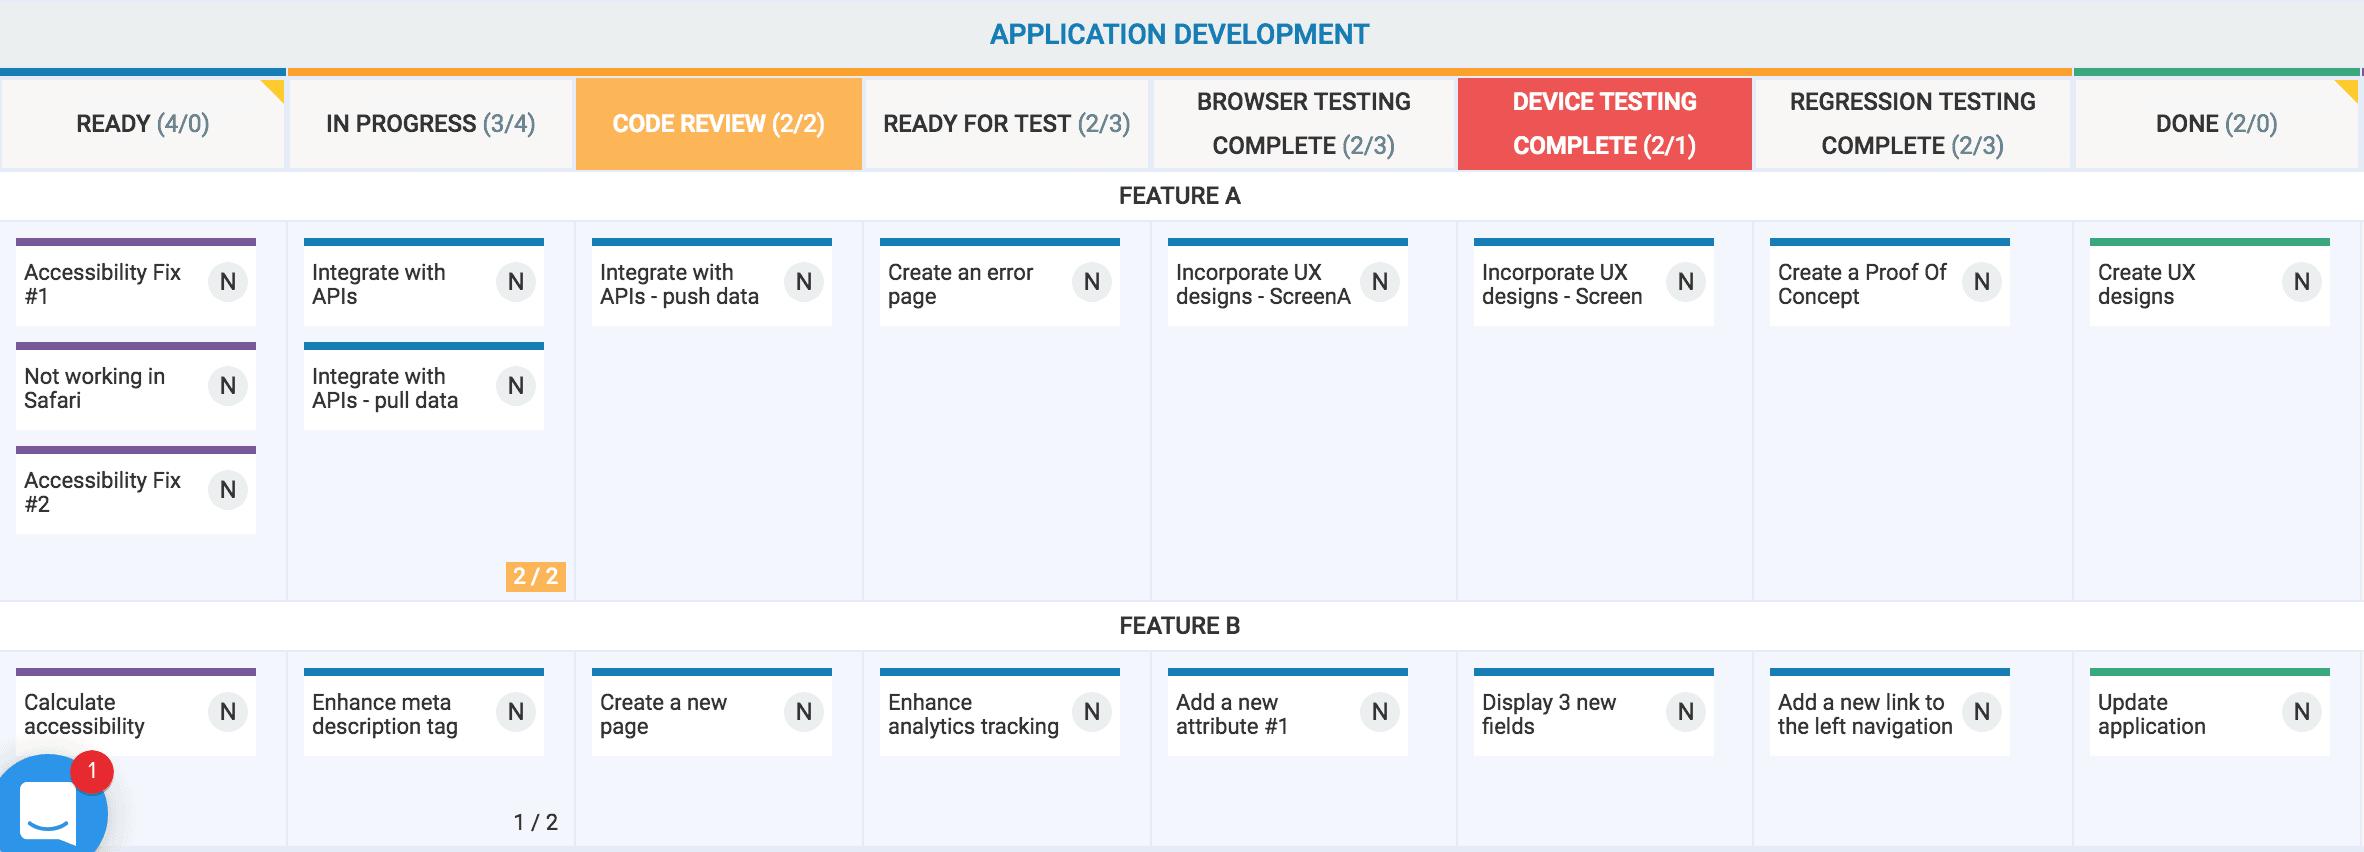 Sample Kanban Board for Application Development